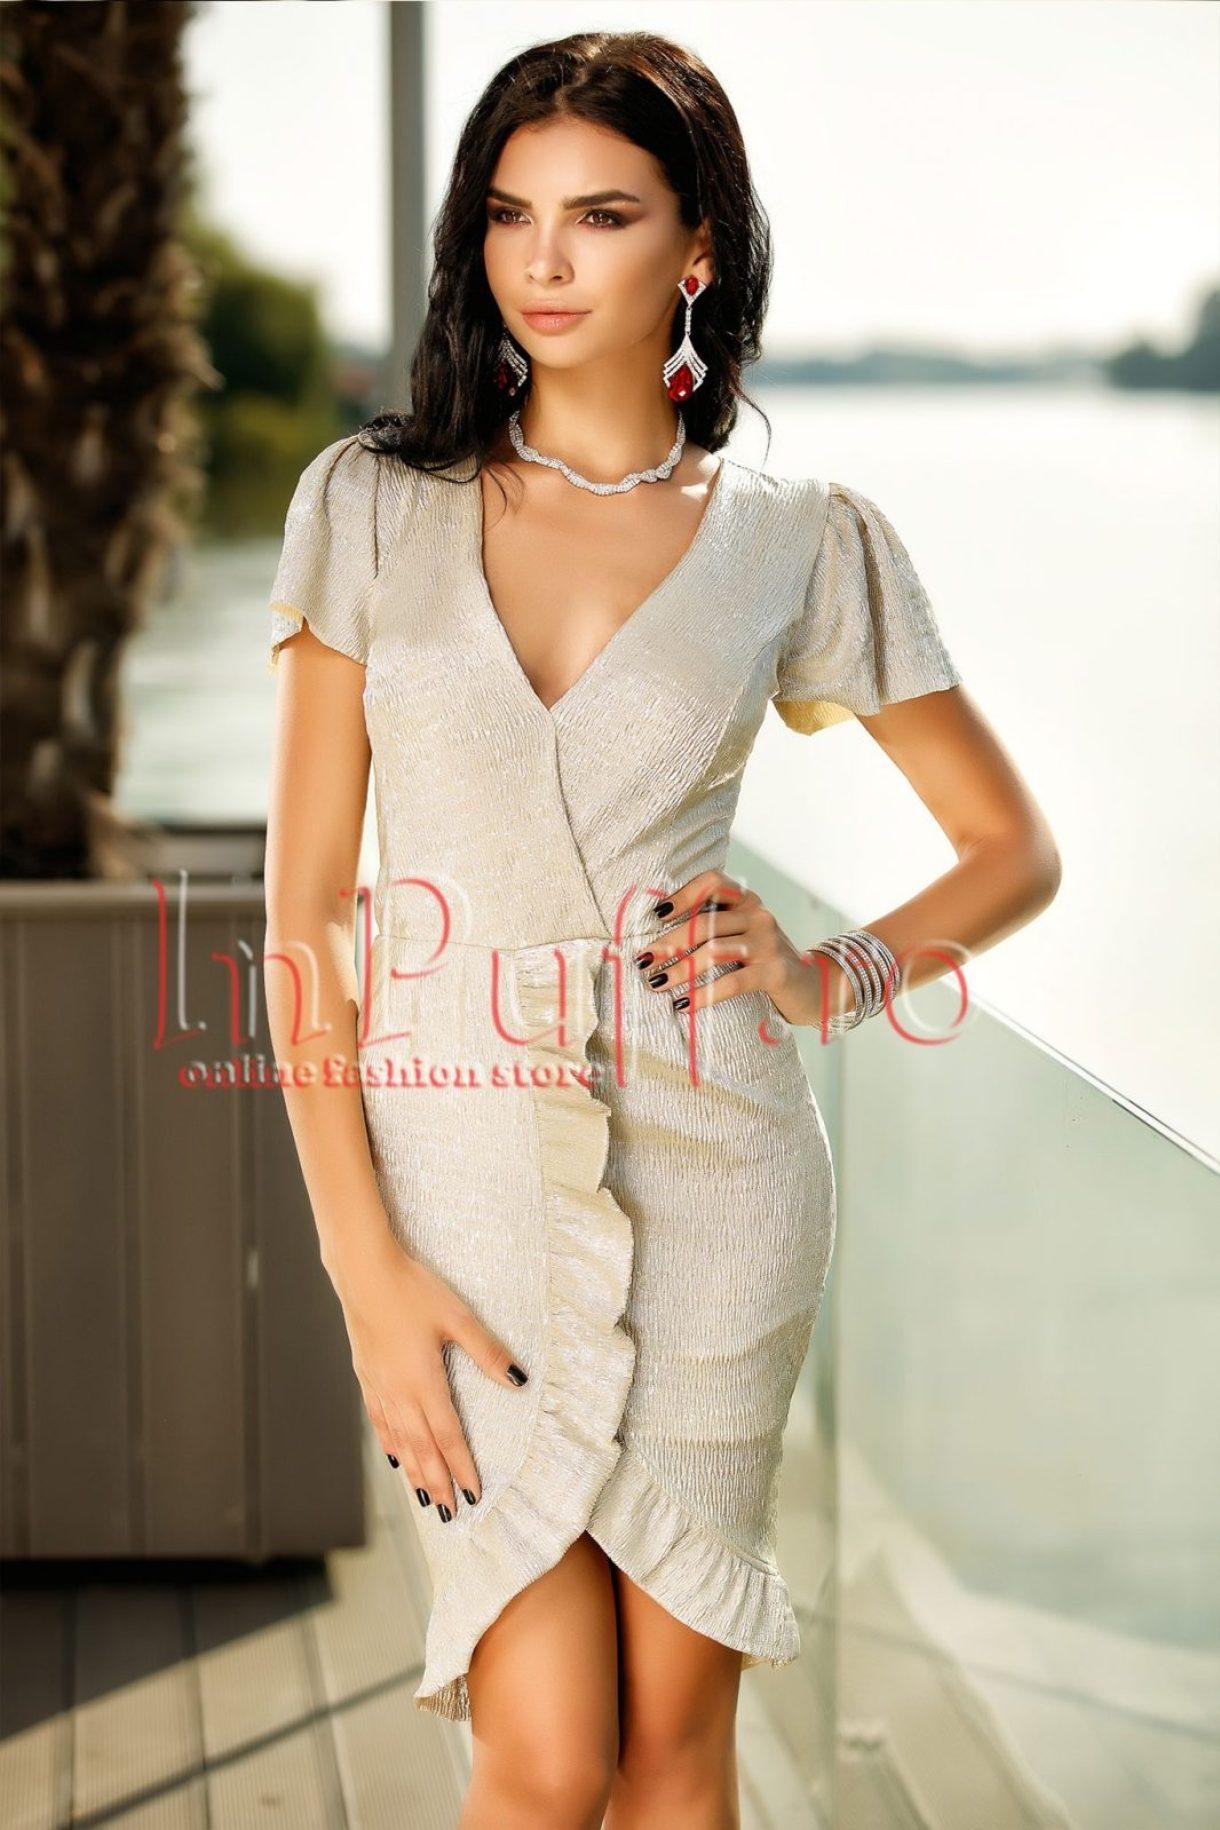 rochie-argintie-midi-din-crep-cu-volane-1504267791-4